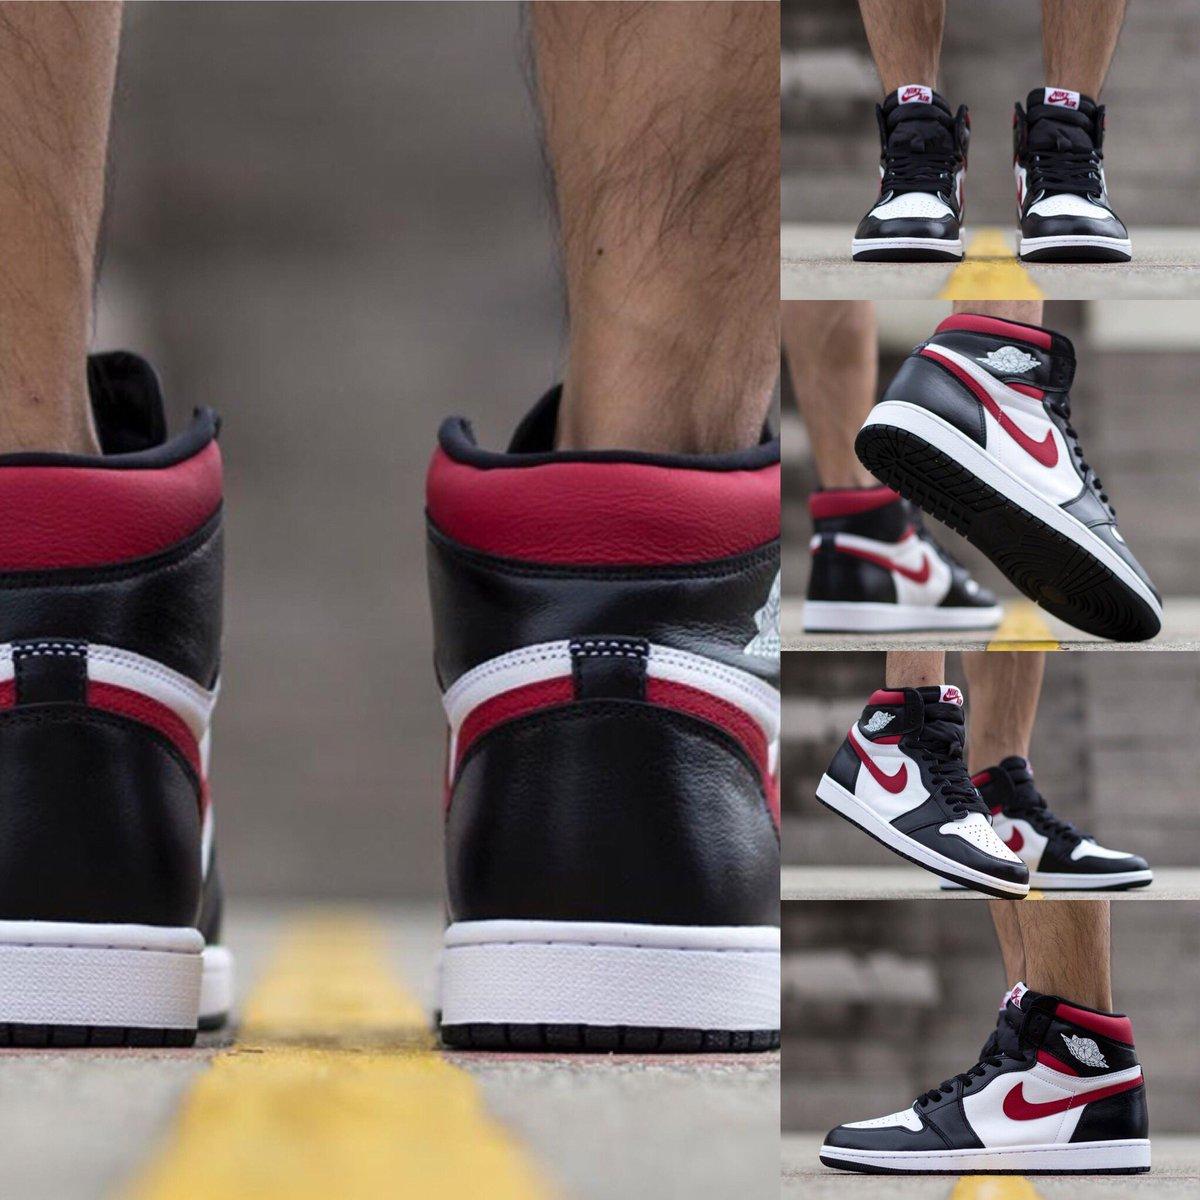 best website 9c088 cfbf5 On-Foot Look At The Upcoming Air Jordan 1 Retro High OG ...